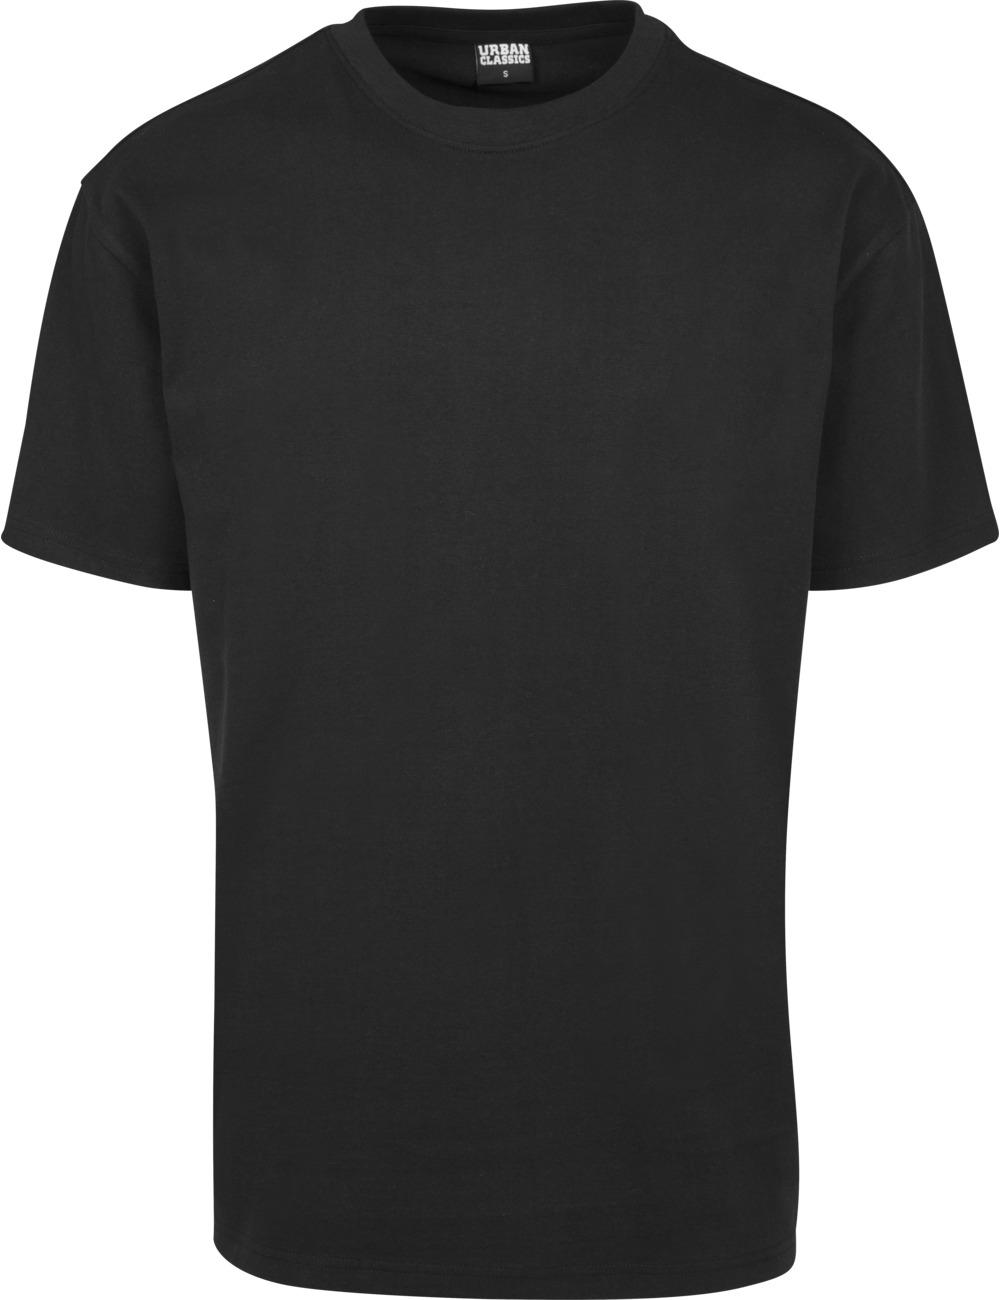 d3854ba83e788f Urban Classics Herren T-Shirt Heavy Oversized kaufen - JEANS-DIRECT.DE